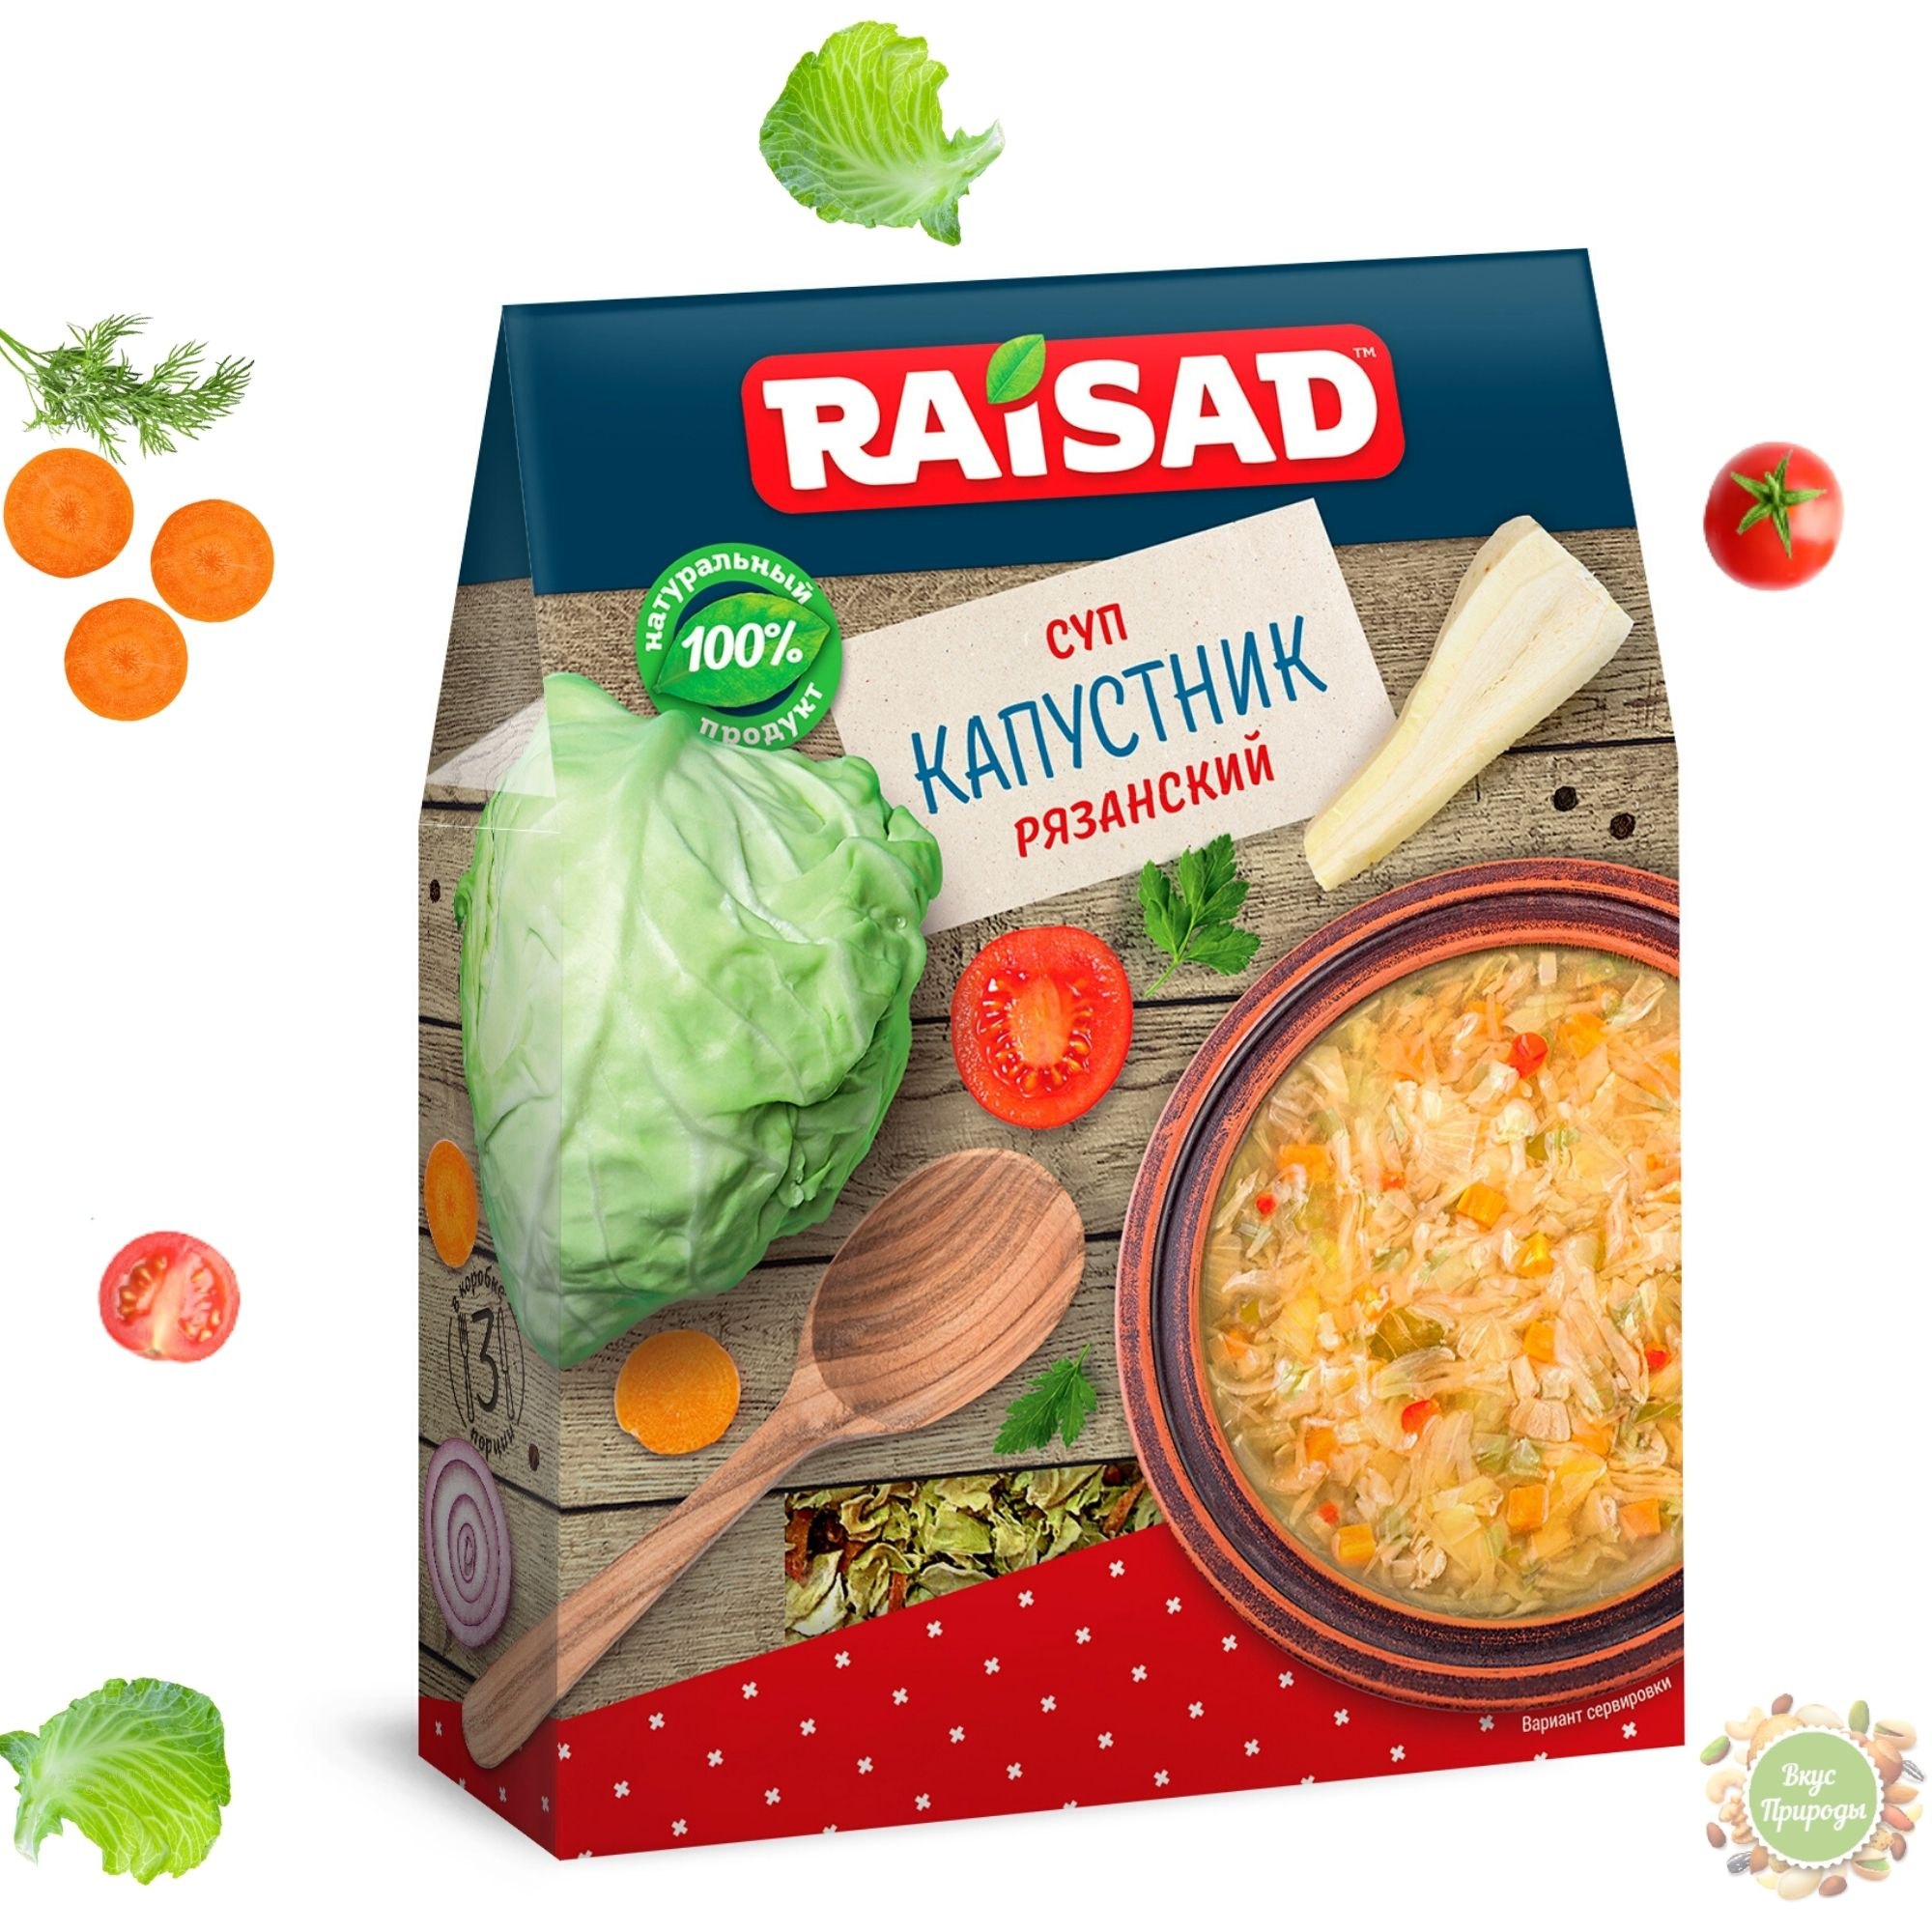 Суп Капустник «Рязанский» 90 гр.